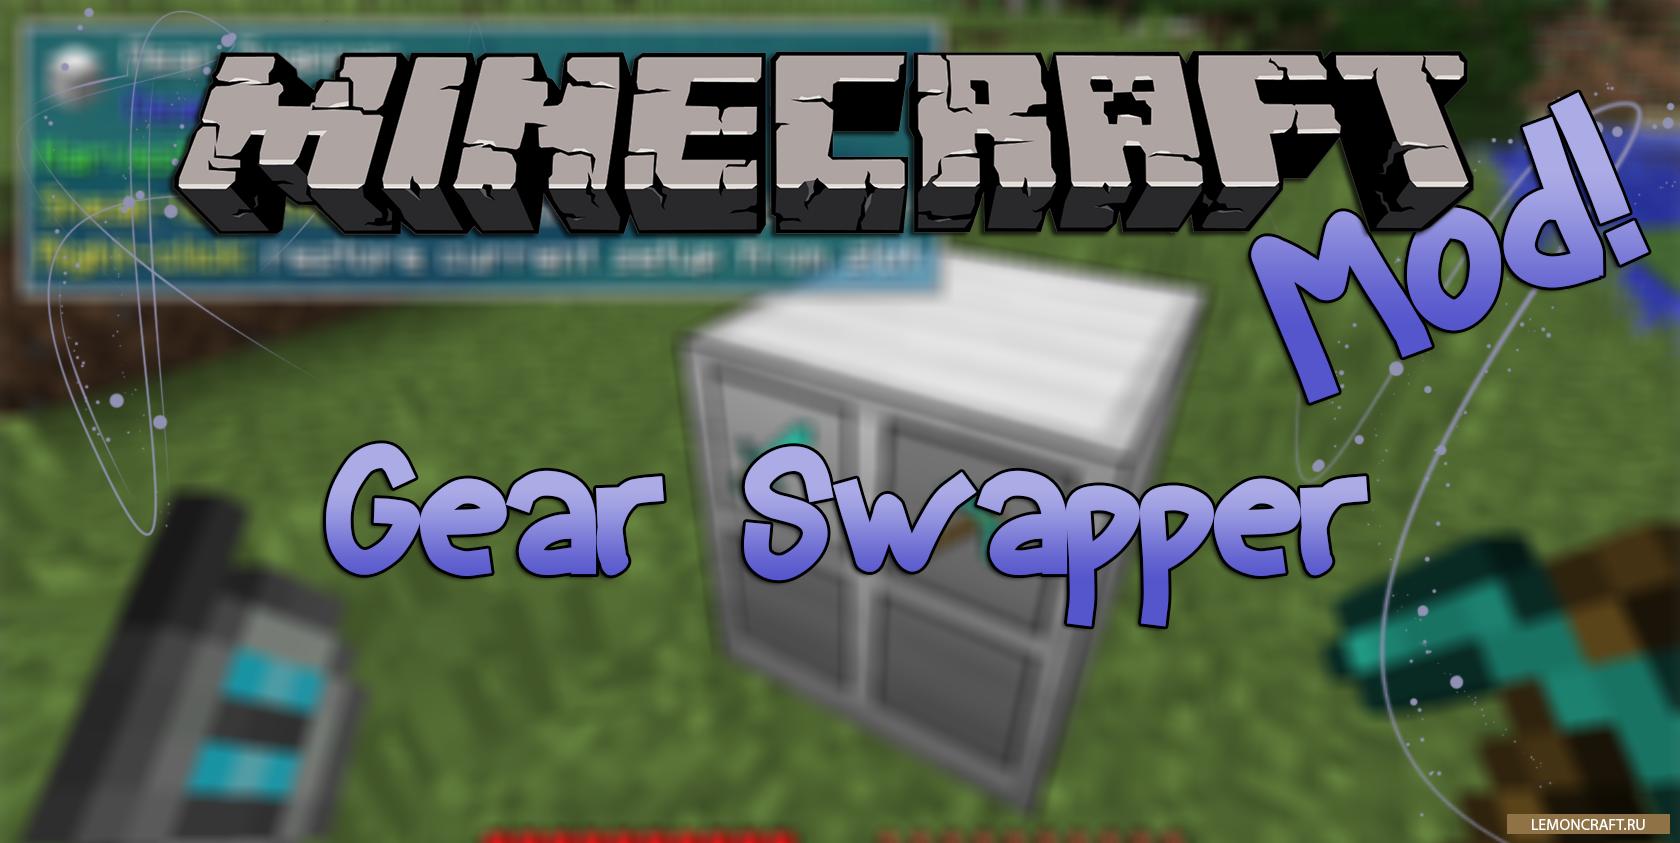 Мод на переключение между блоками Gear Swapper [1.12.2] [1.11.2] [1.10.2] [1.7.10]